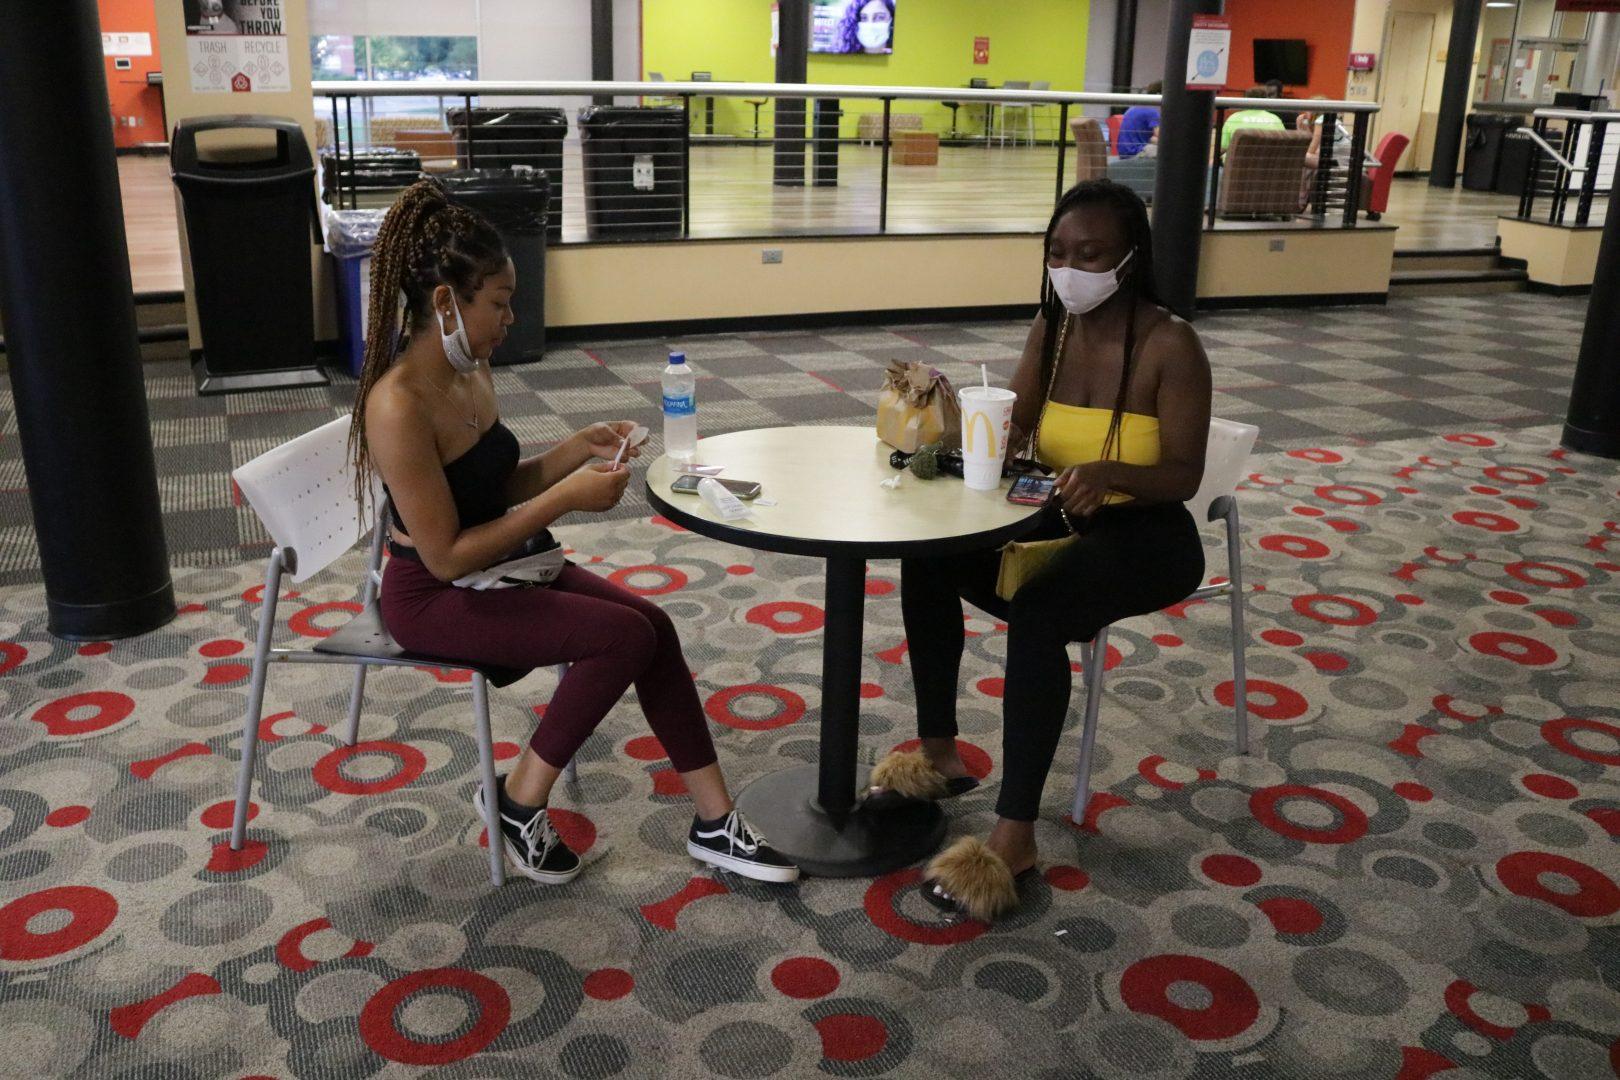 Sophomore psychology major Desiree Legree and sophomore exercise science major Gerri Bonner eat inside in Schwitzer Student Center while wearing masks on Sept. 13.